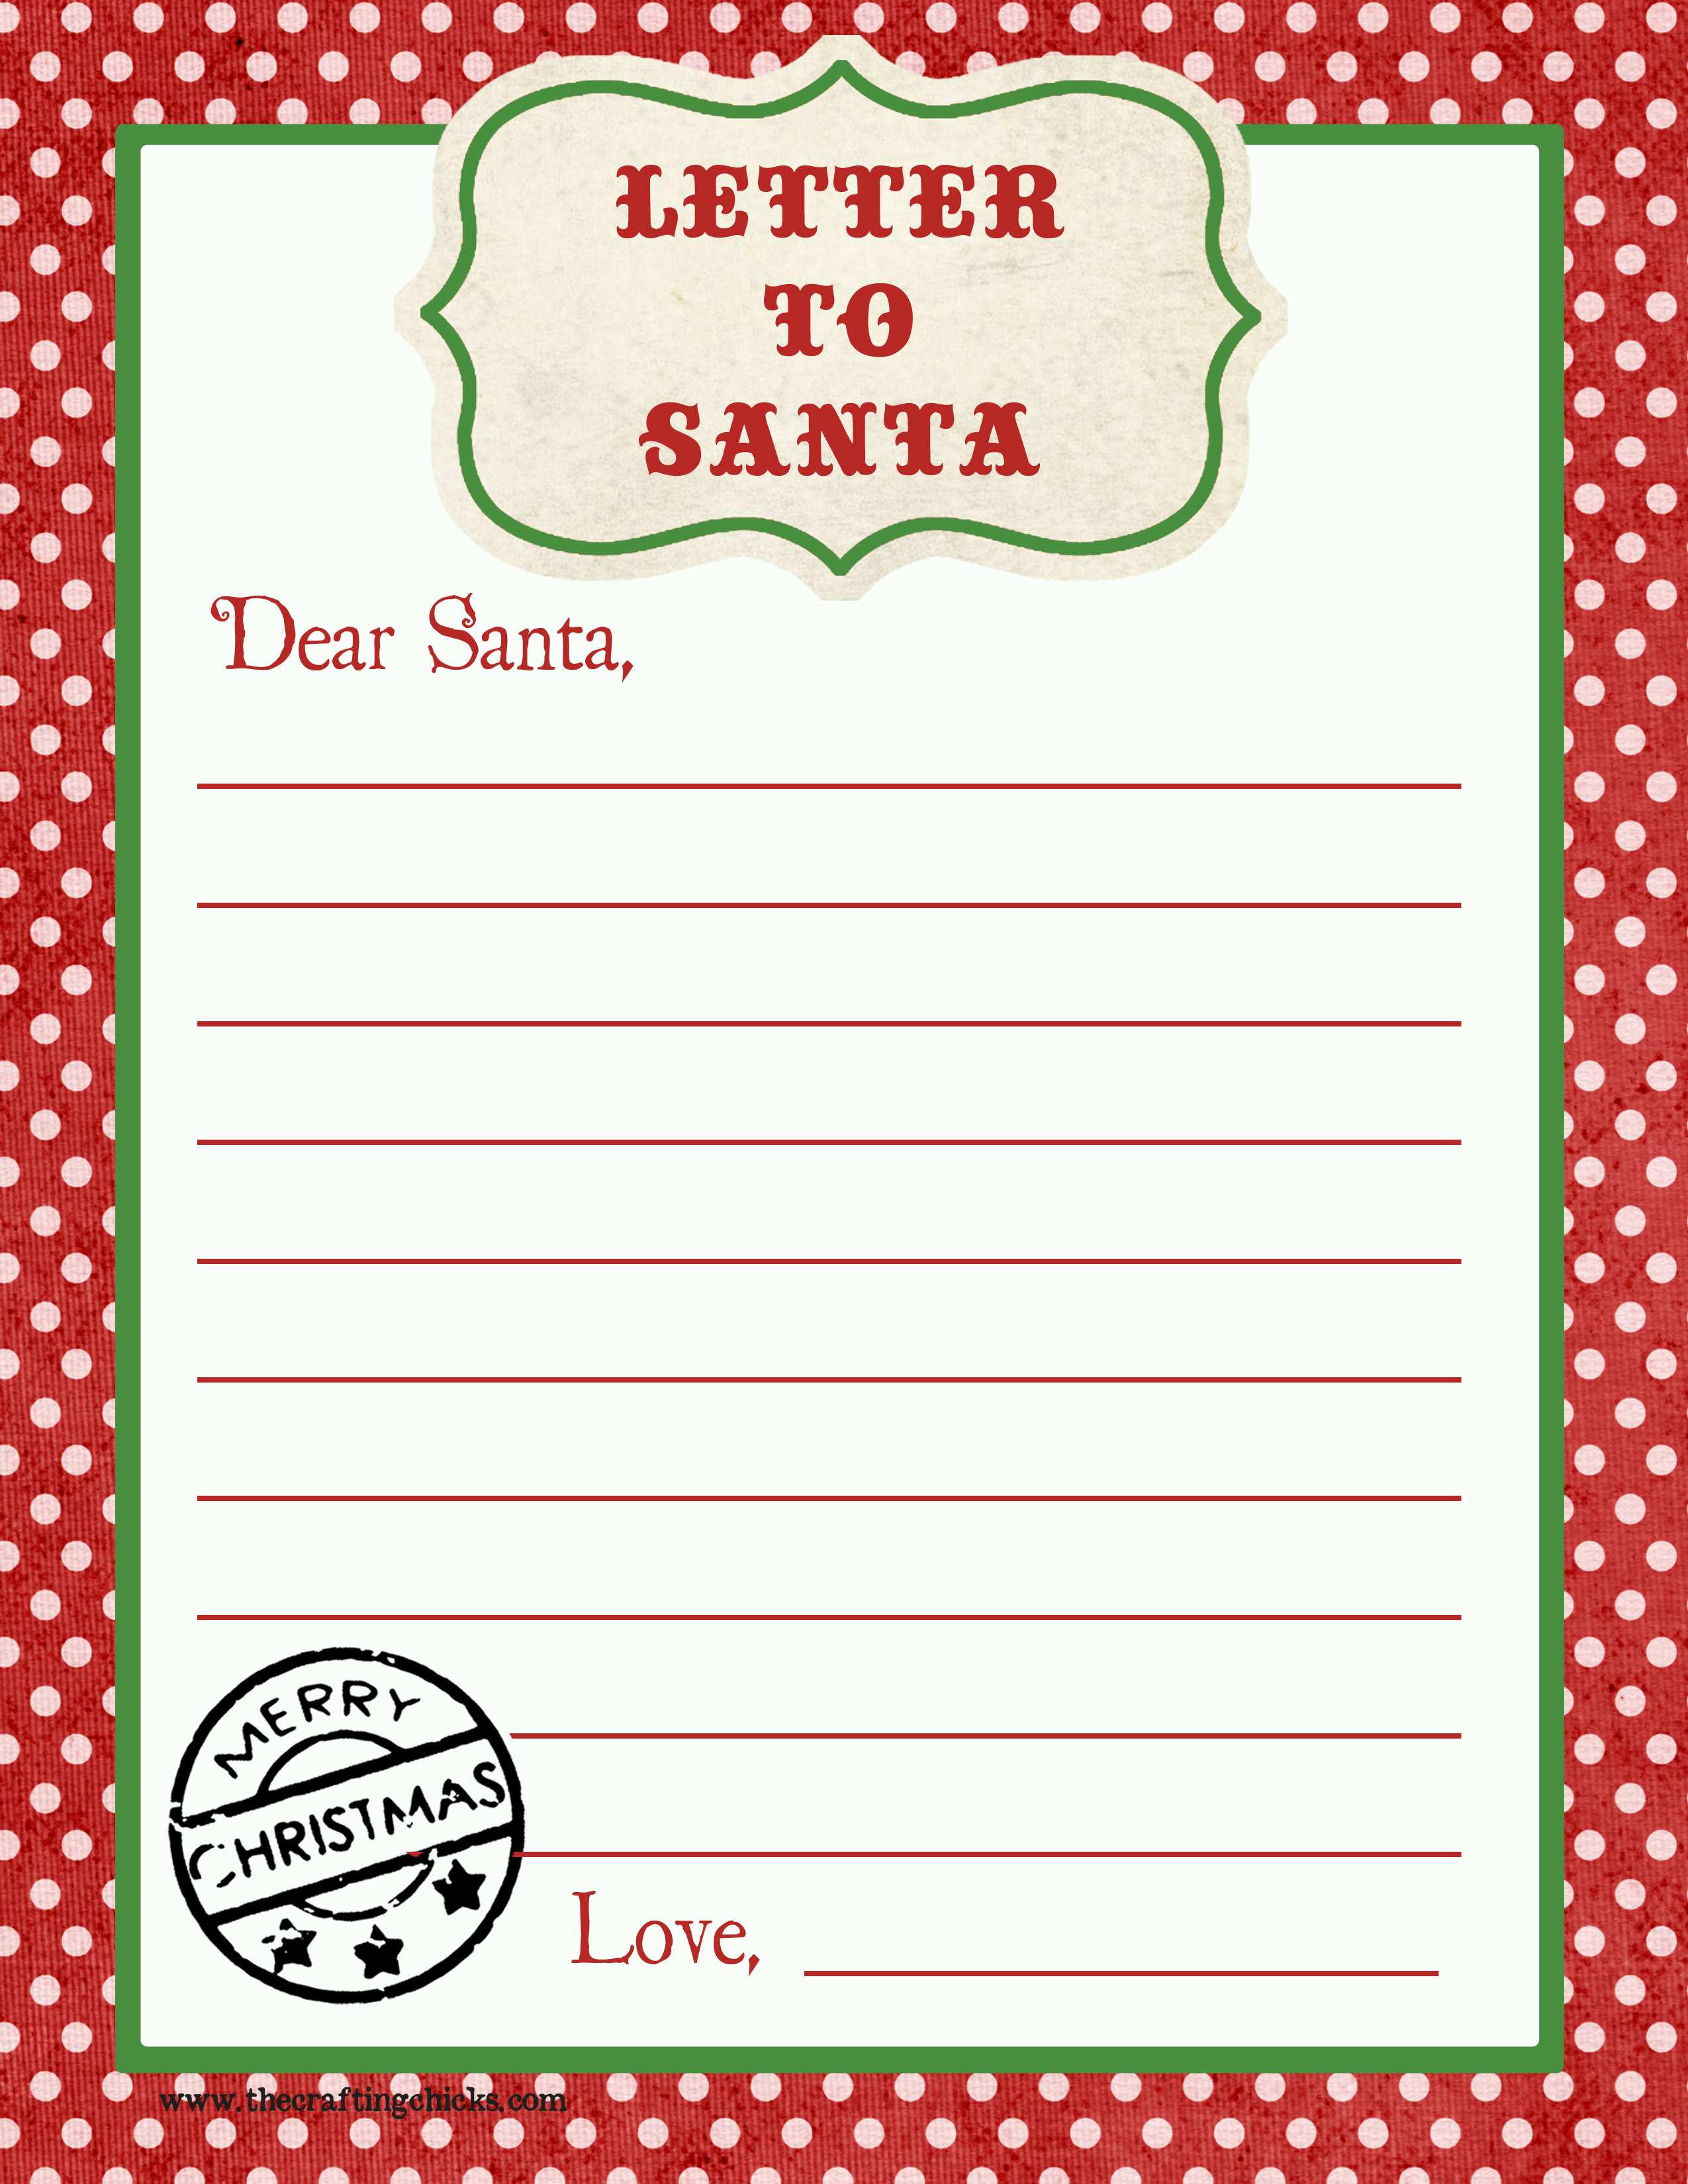 Letter To Santa Free Printable Download - Letter To Santa Template Free Printable